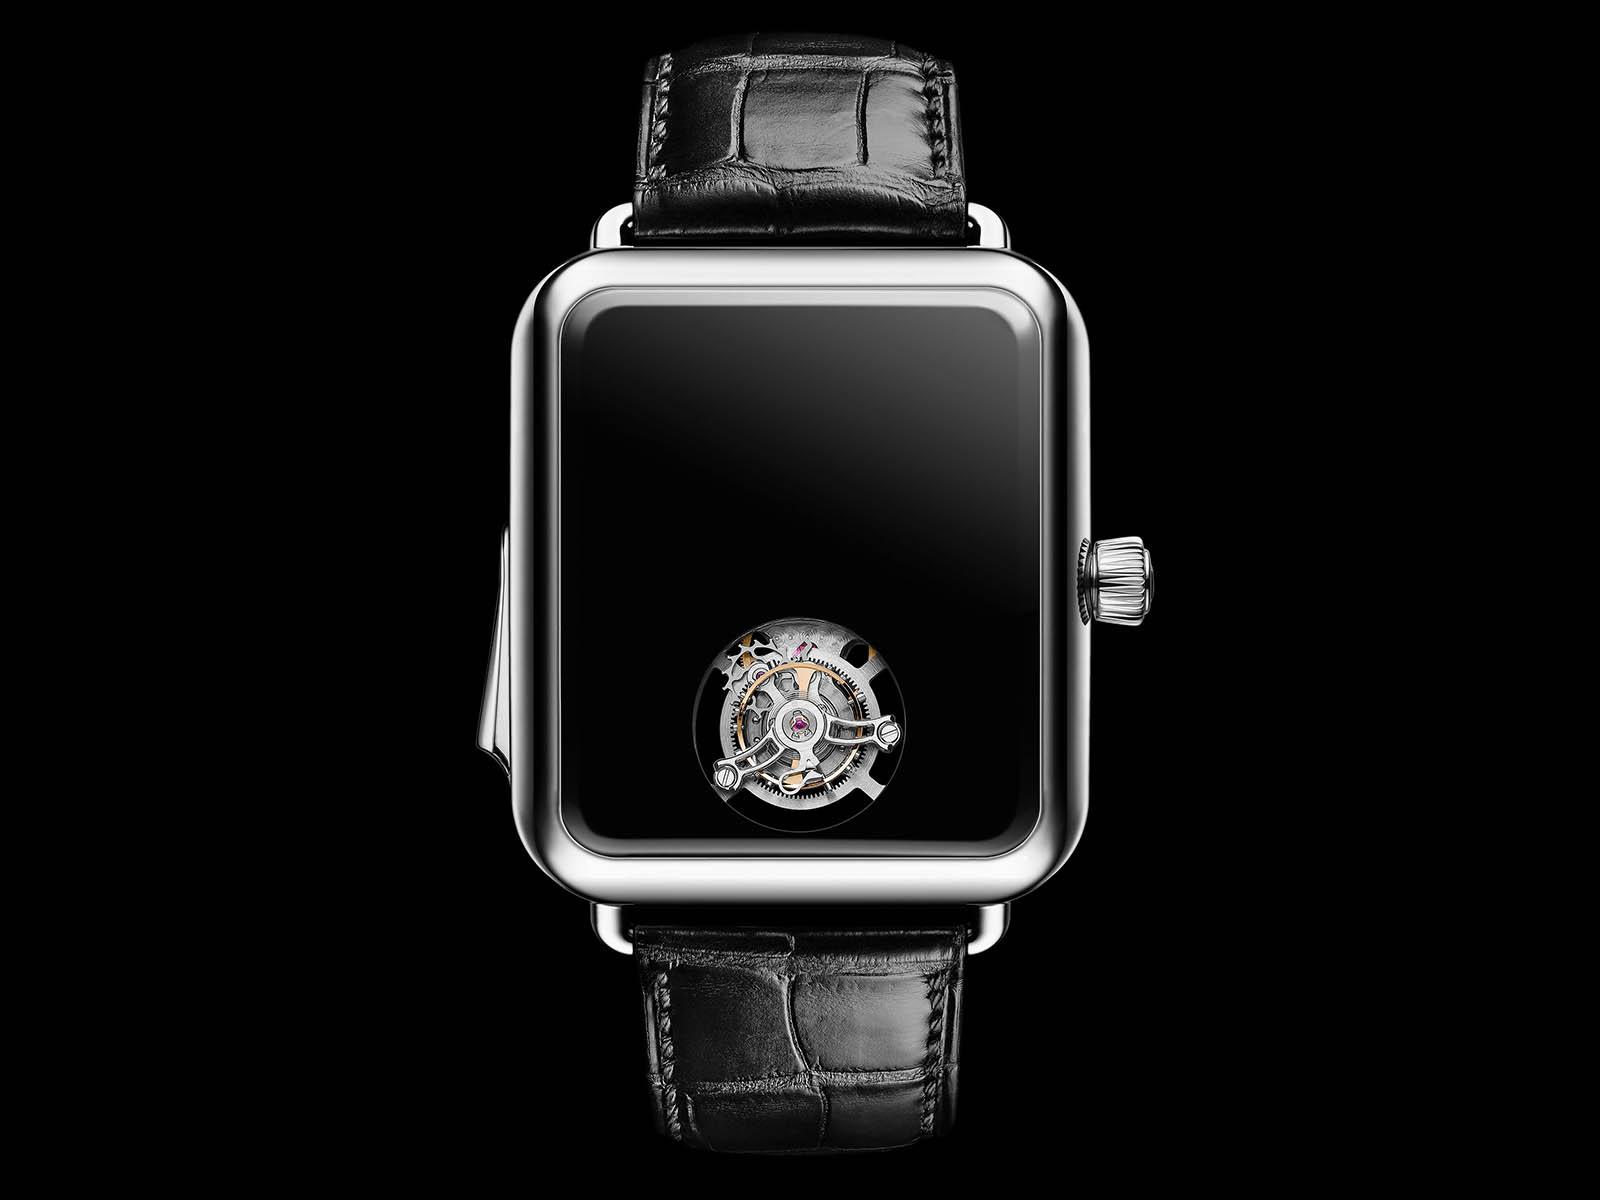 5901-0301-h-moser-cie-swiss-alp-watch-minute-repeater-concept-black-3.jpg